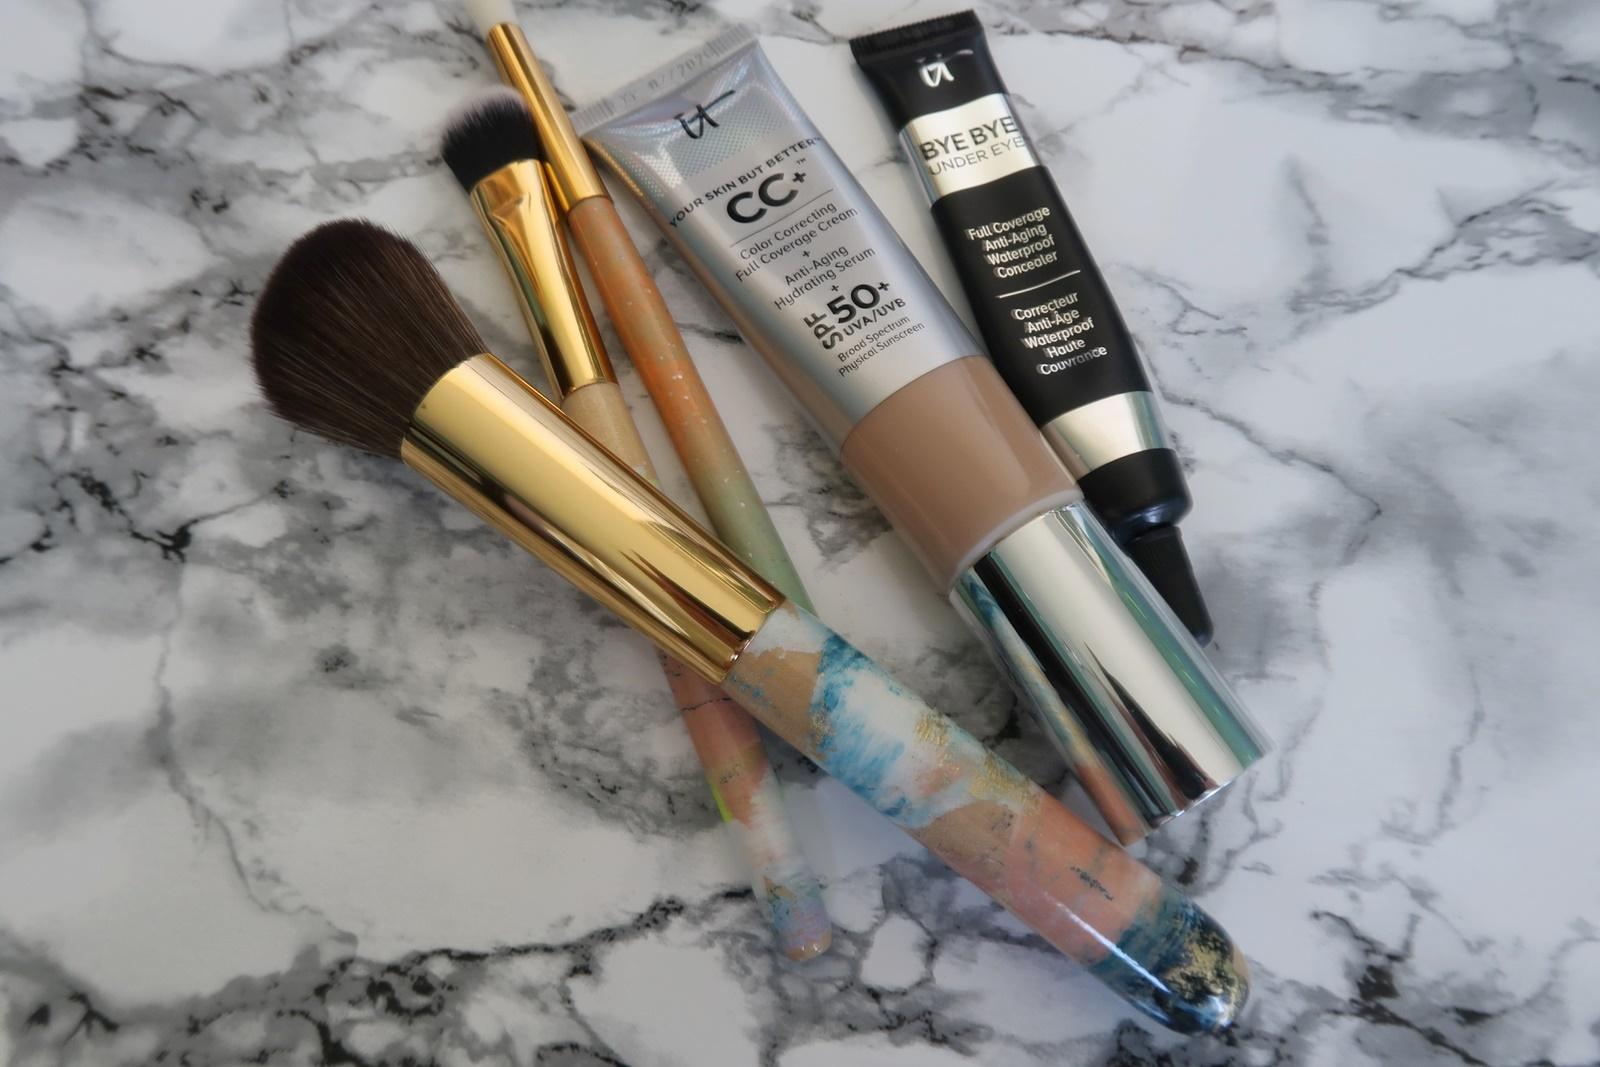 glamupyourlifestyle ü50 ue50 Make-up-Routine roter-Lippenstift vegane-Pinsel Miriam-Jacks nude-by-nature